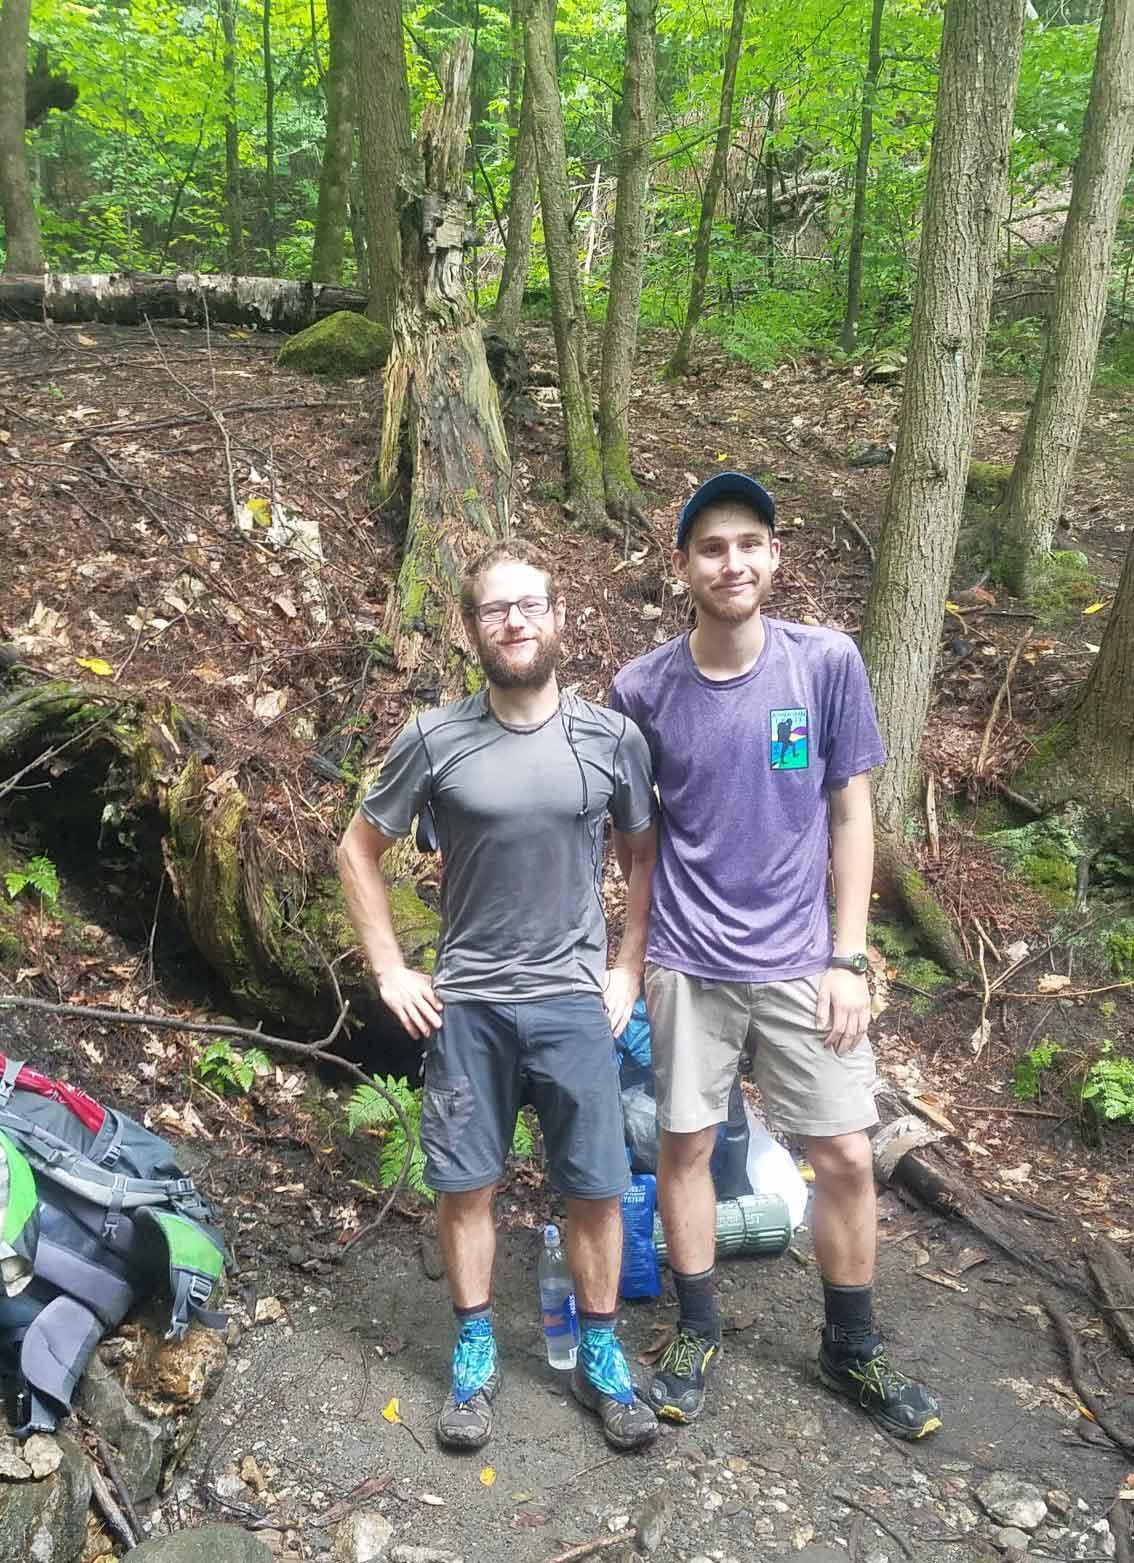 Blitz and Matthew Hiking on the Appalachian Trail